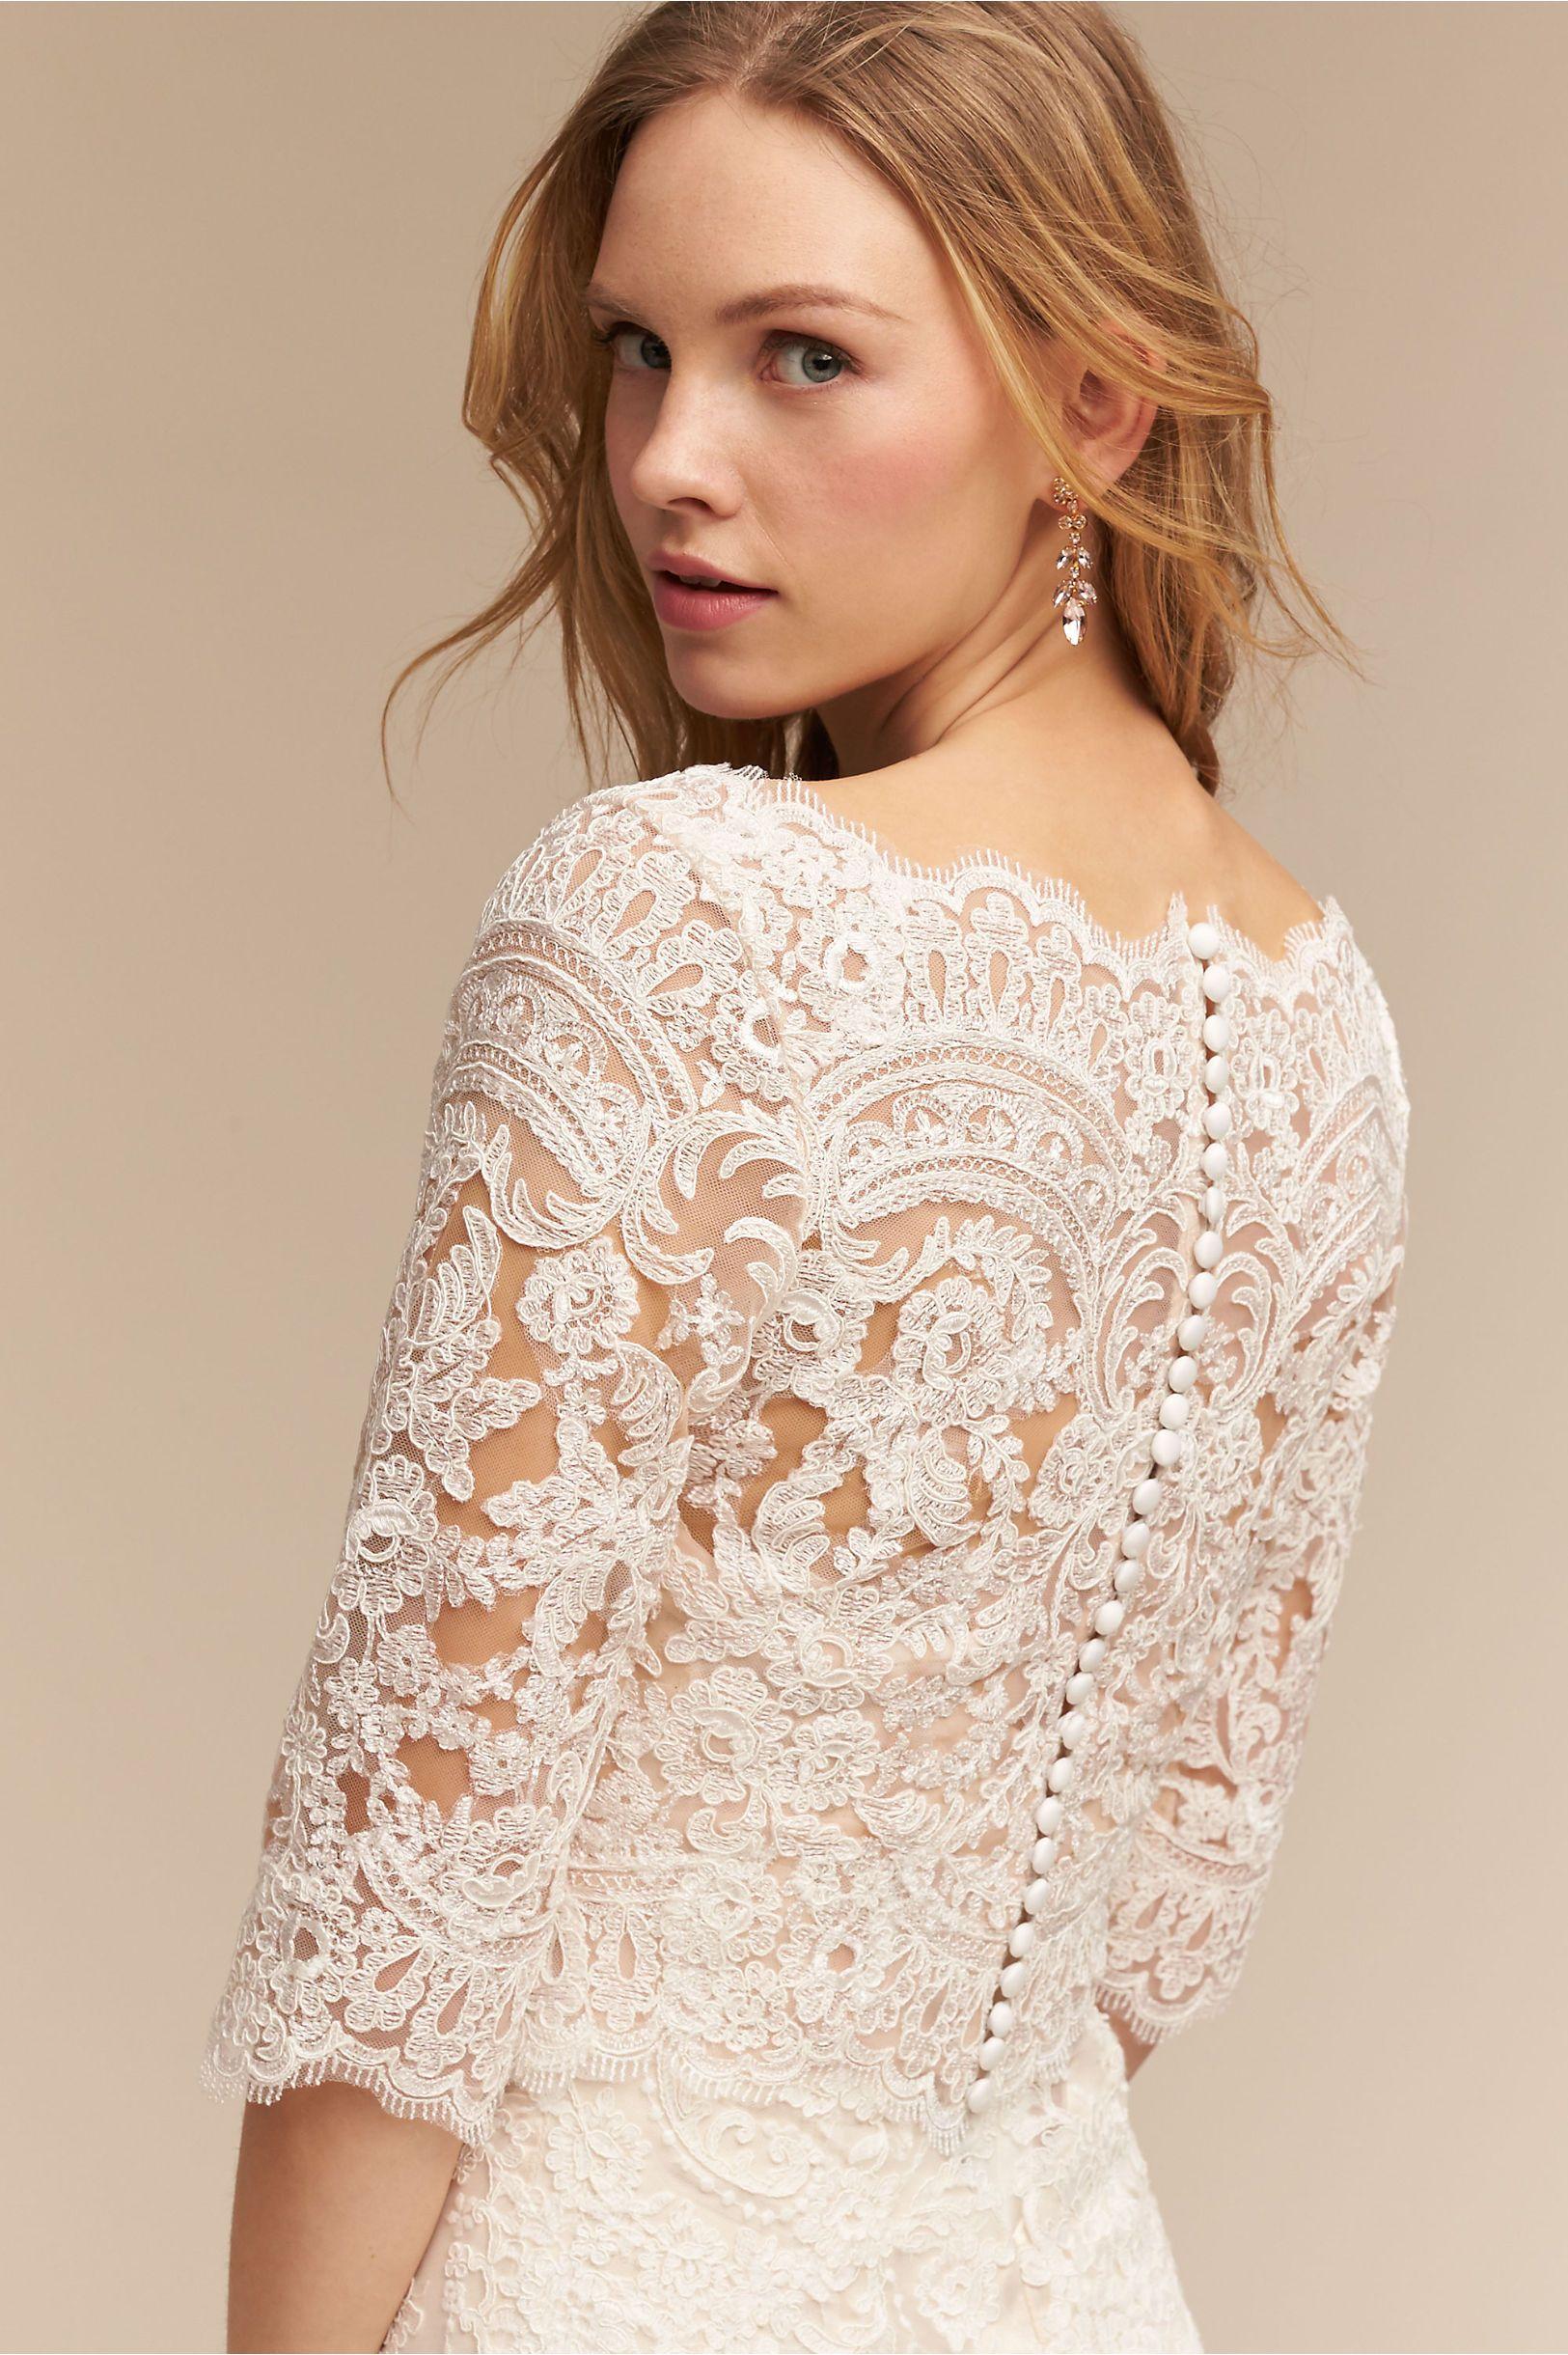 BHLDN Capri Top in Bride Wedding Dresses Lace | BHLDN | SpecialDay ...